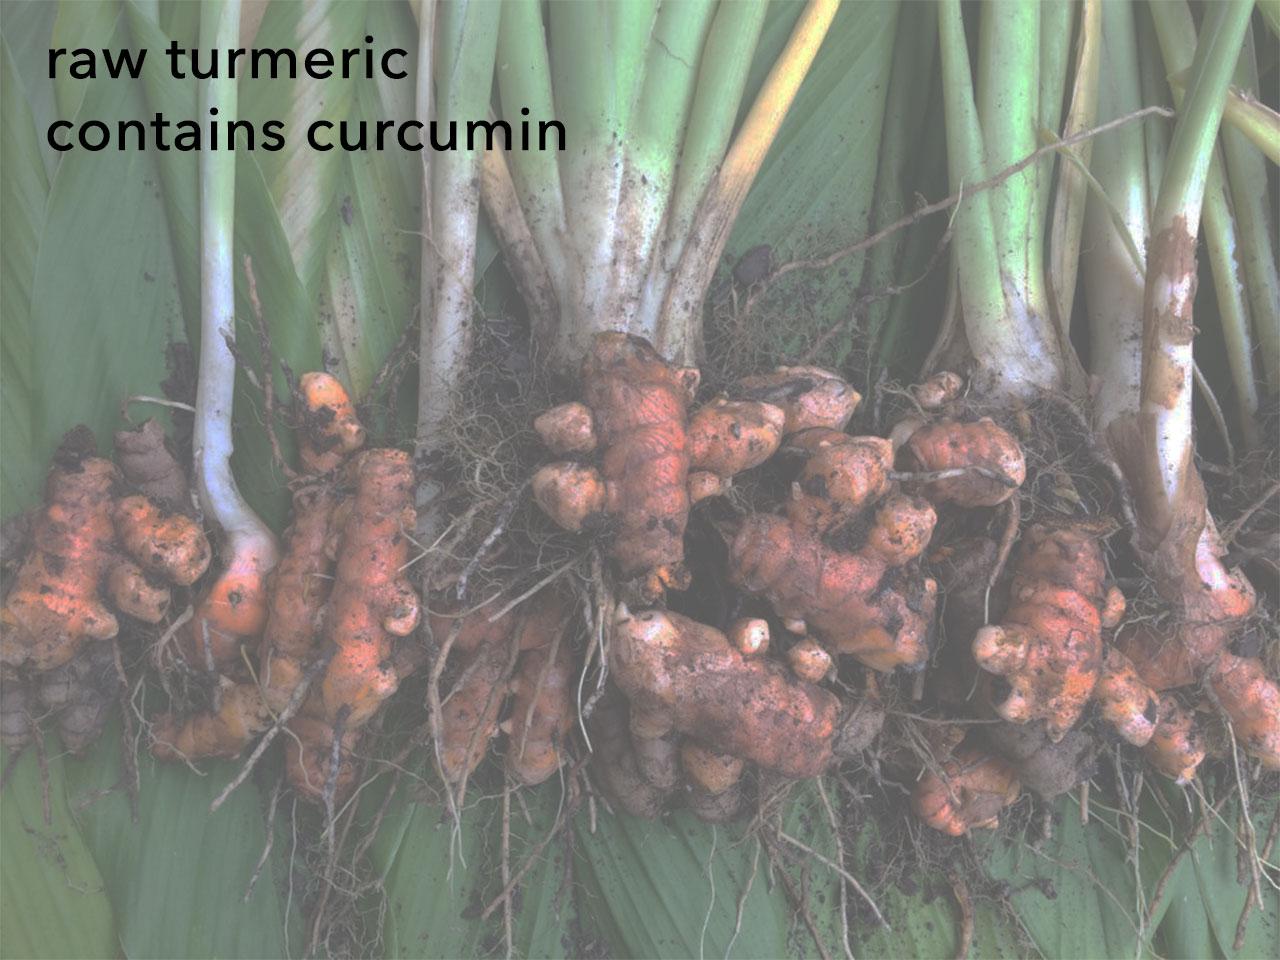 raw turmeric contains curcumin